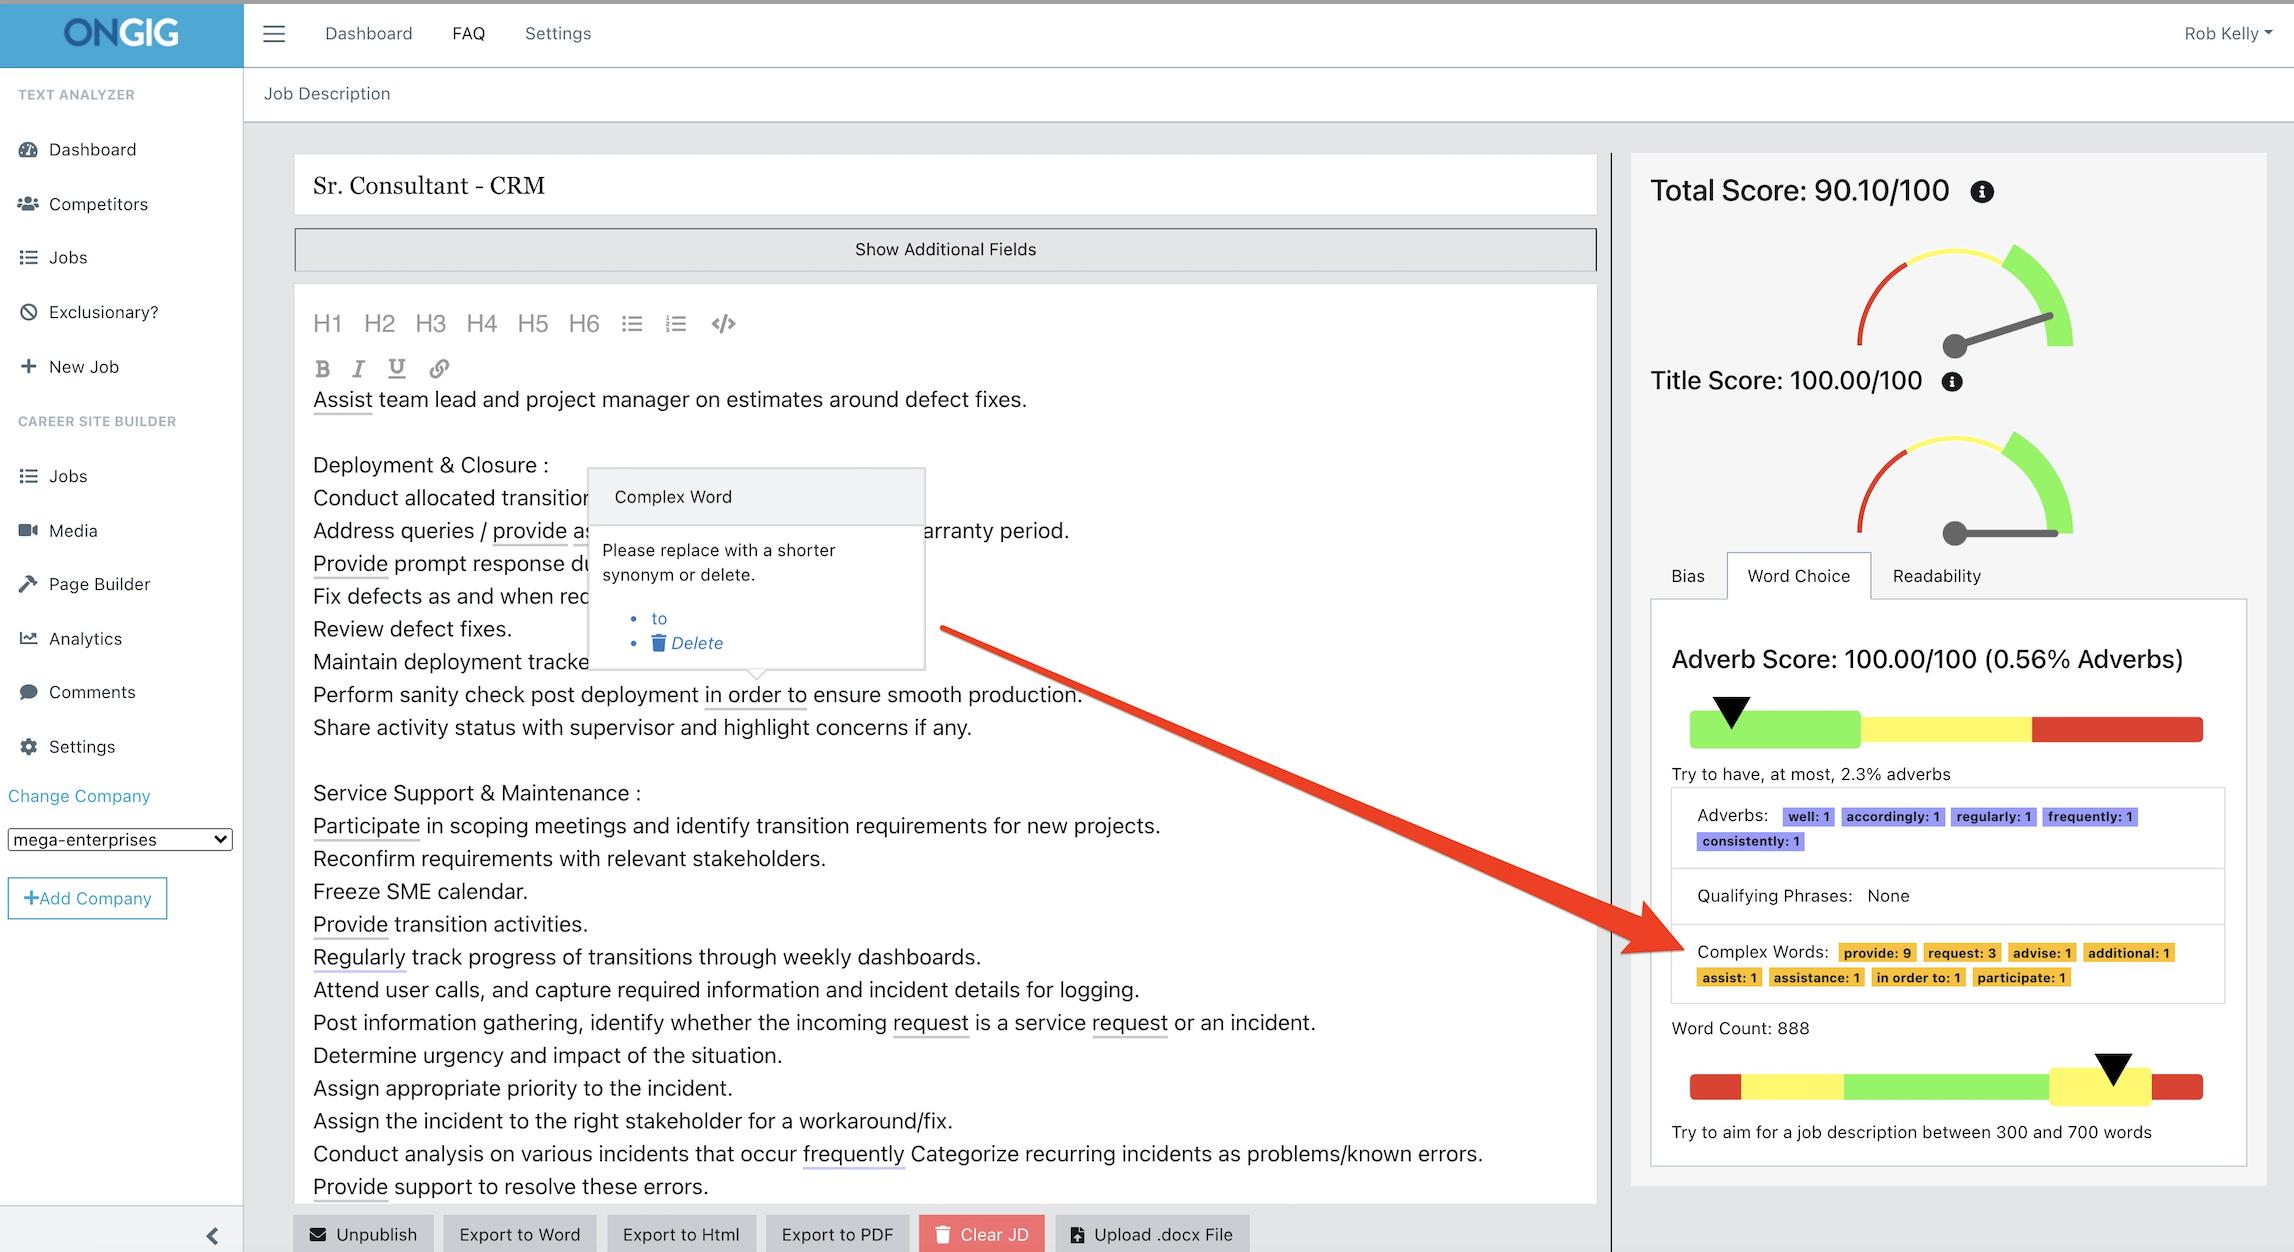 augmented_writing_job_description_tool_complex words